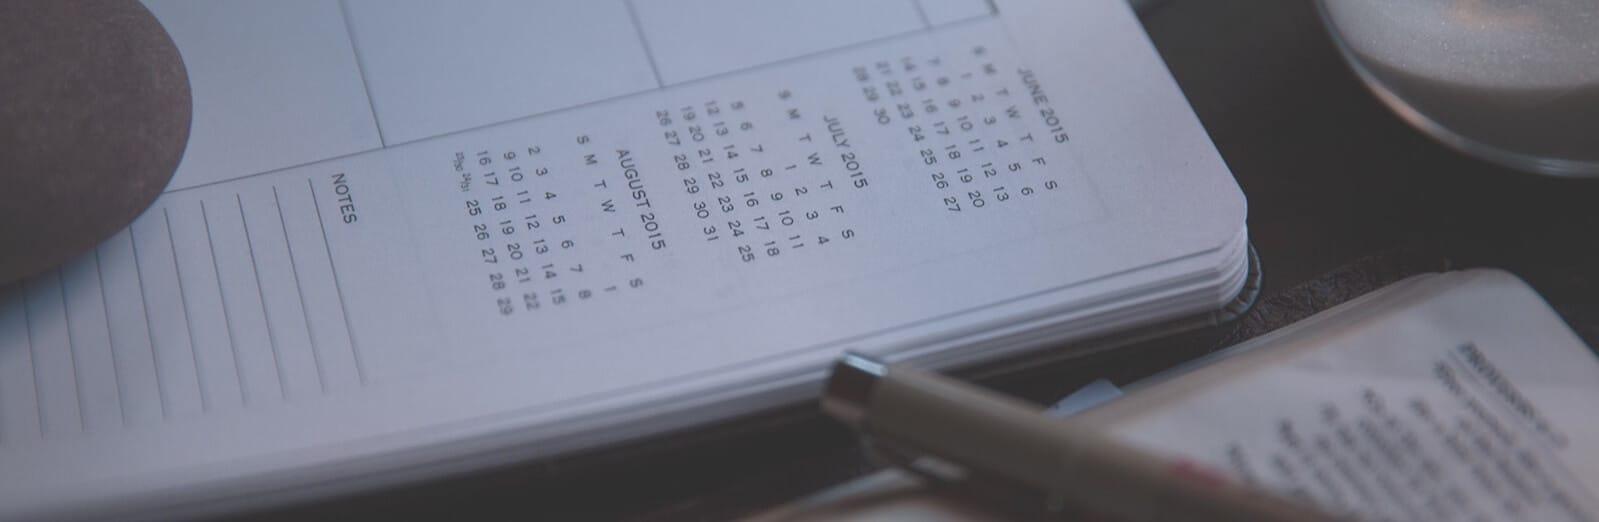 Das Kalendermodul konfigurieren